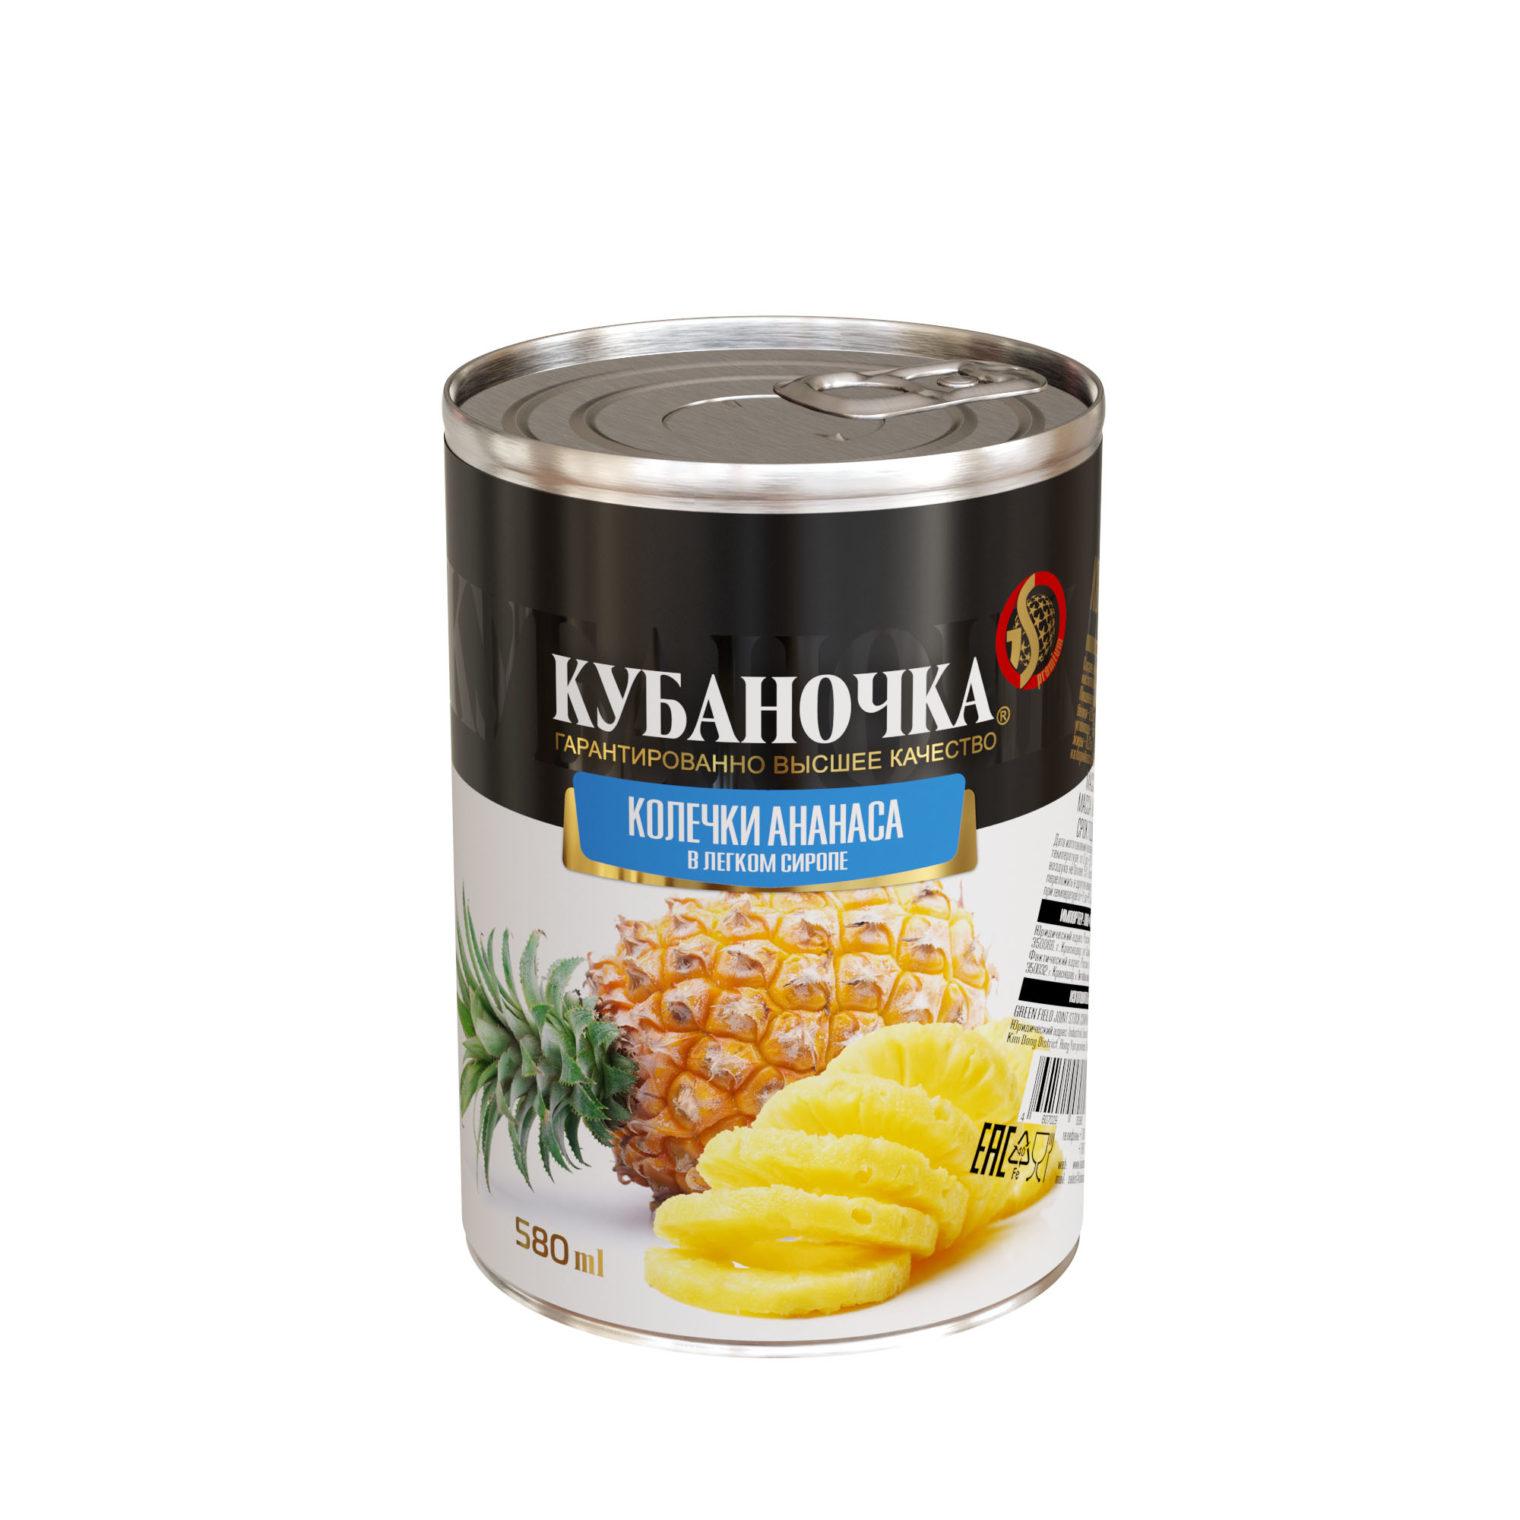 Колечки ананаса в легком сиропе, Масса: 565 г